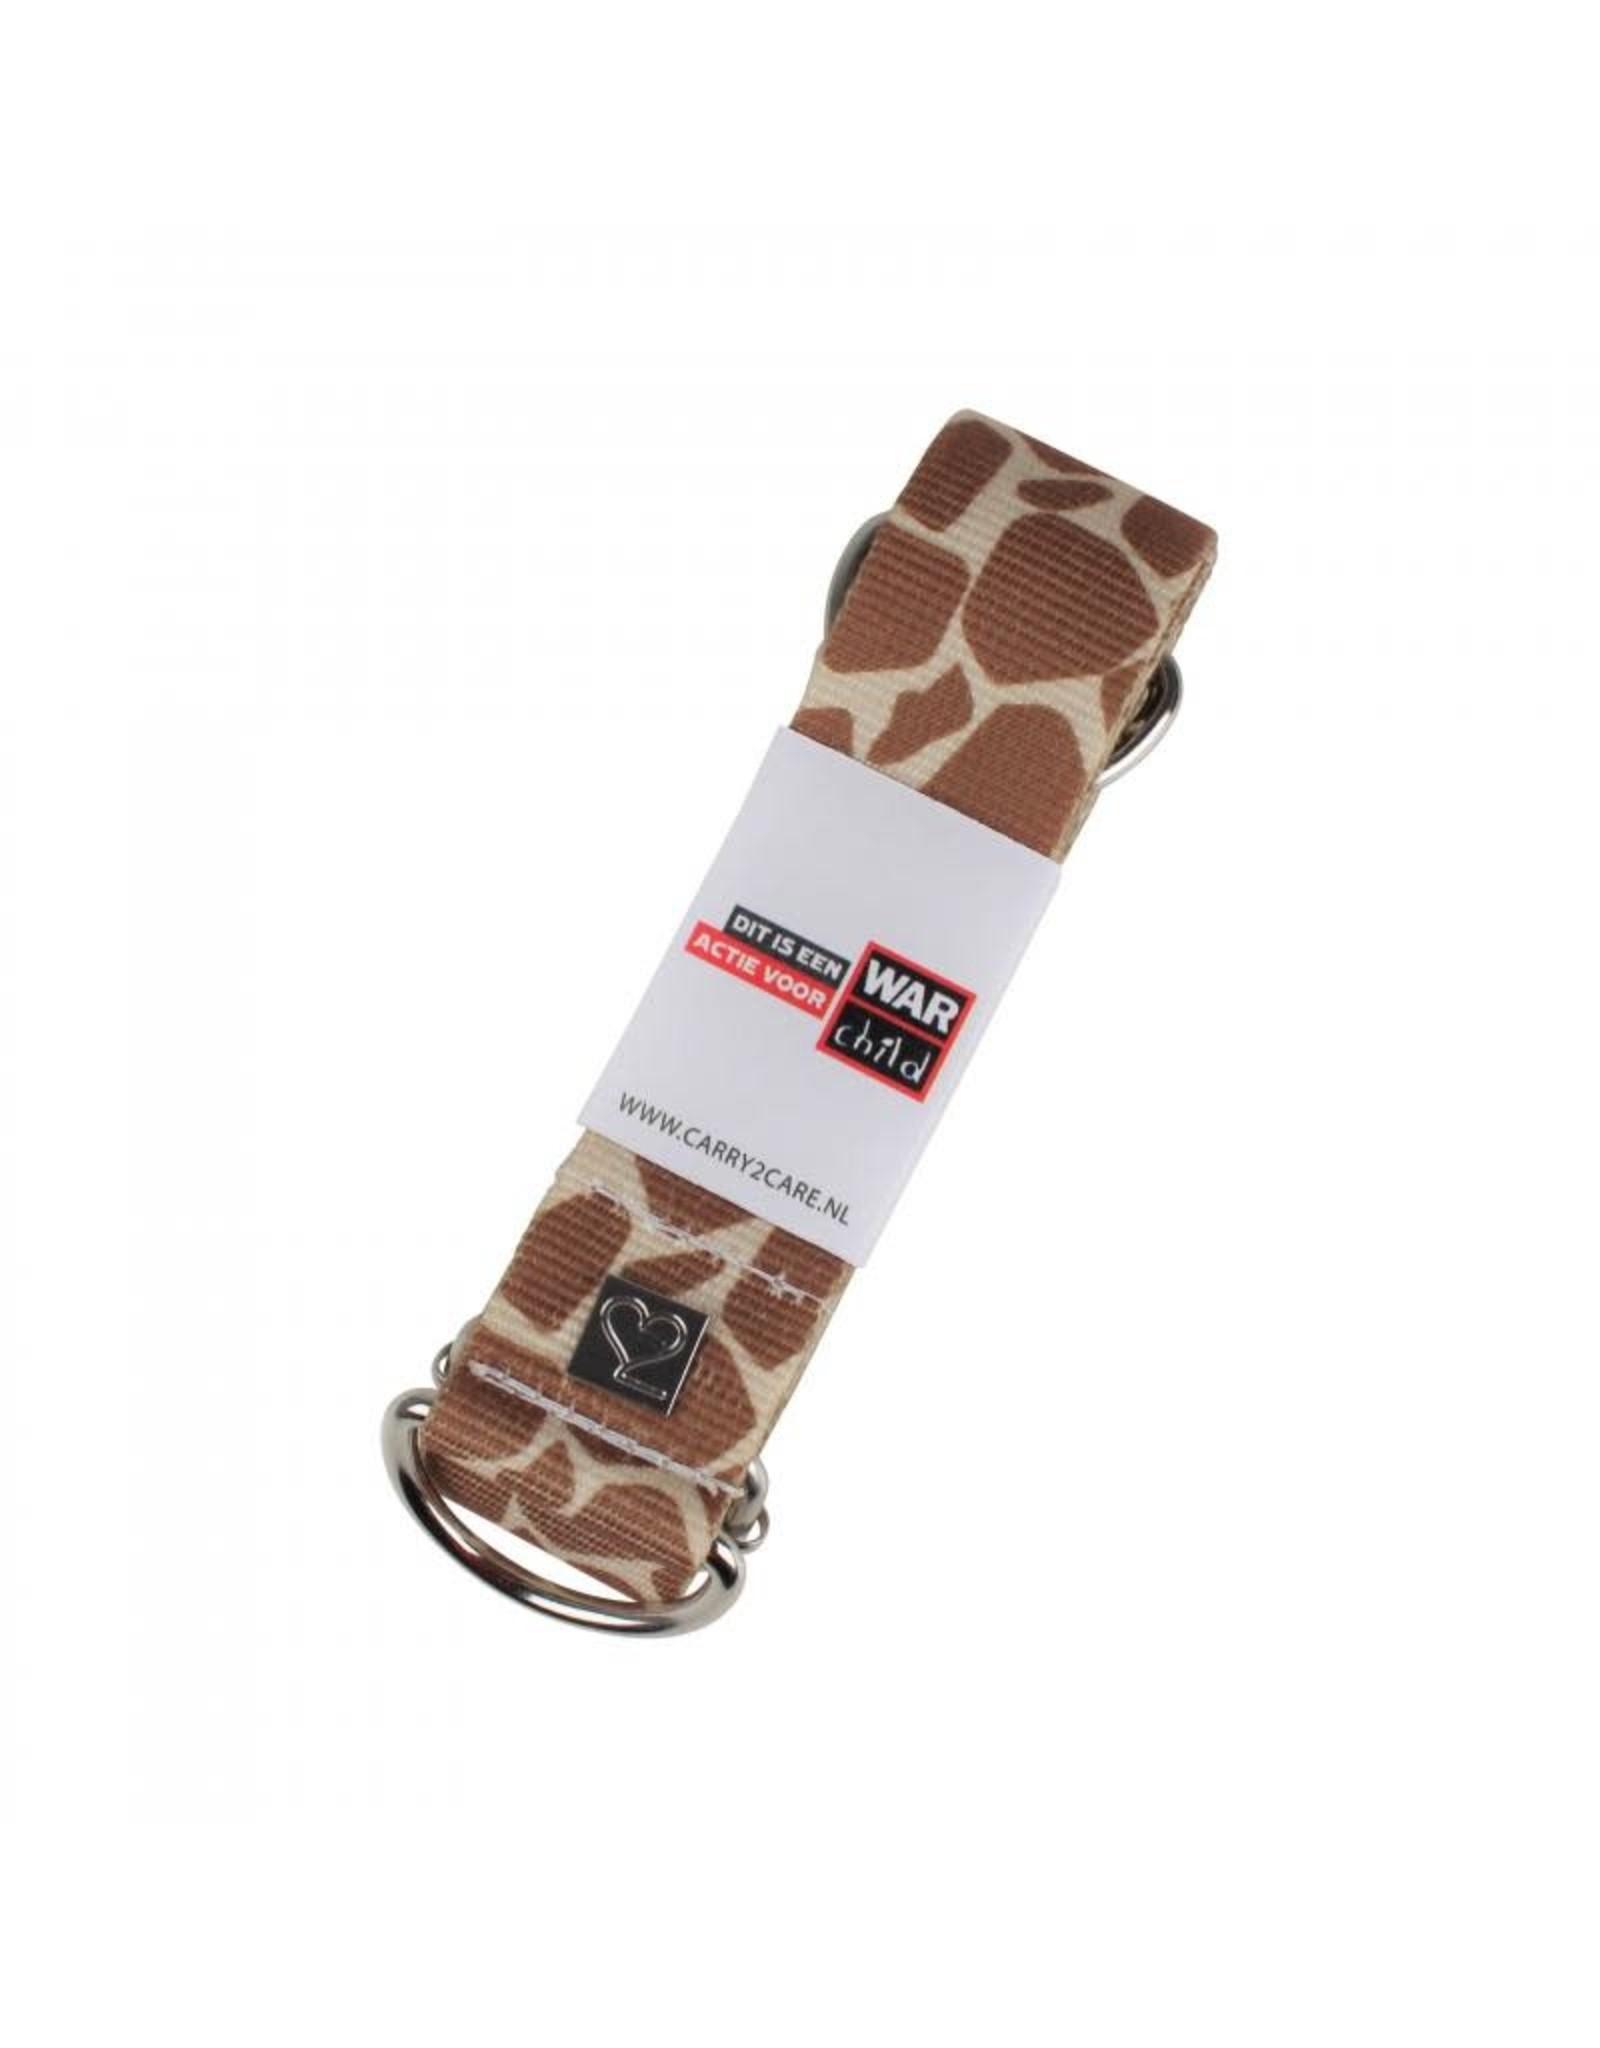 Carry 2 Care Carry 2 Care band giraffe